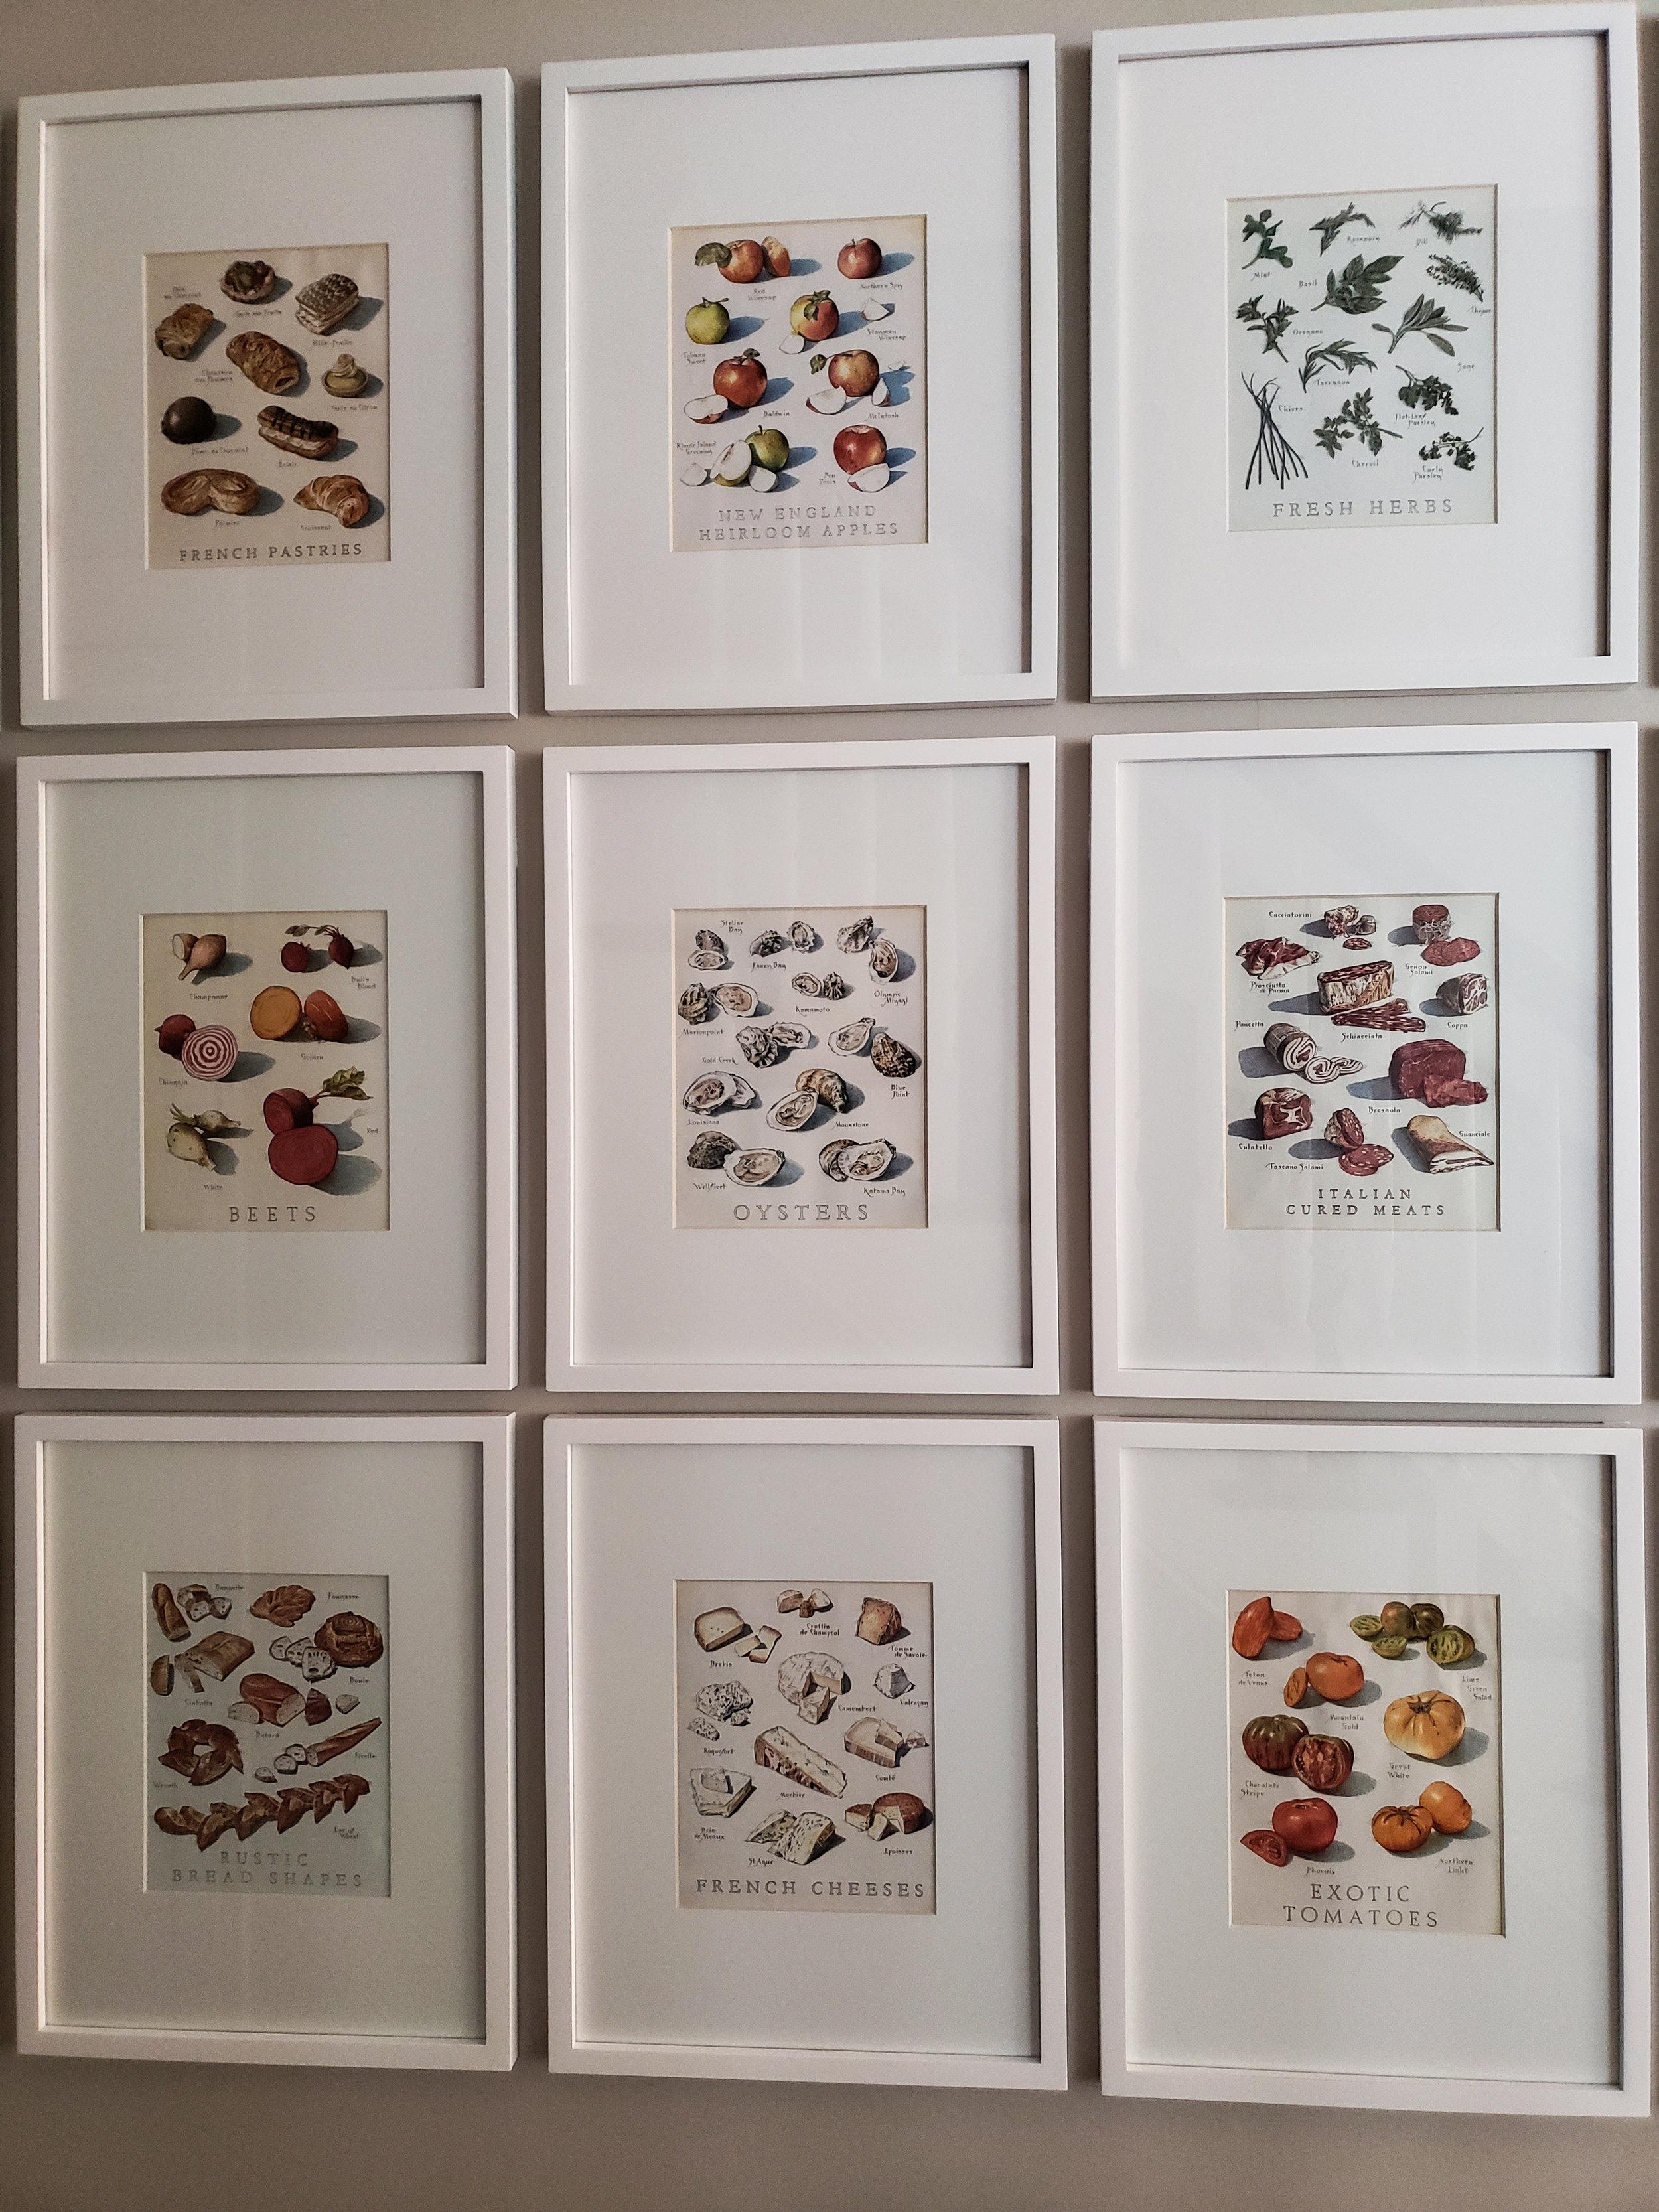 John Burgoyne's illustrations on display at the Tetreault house